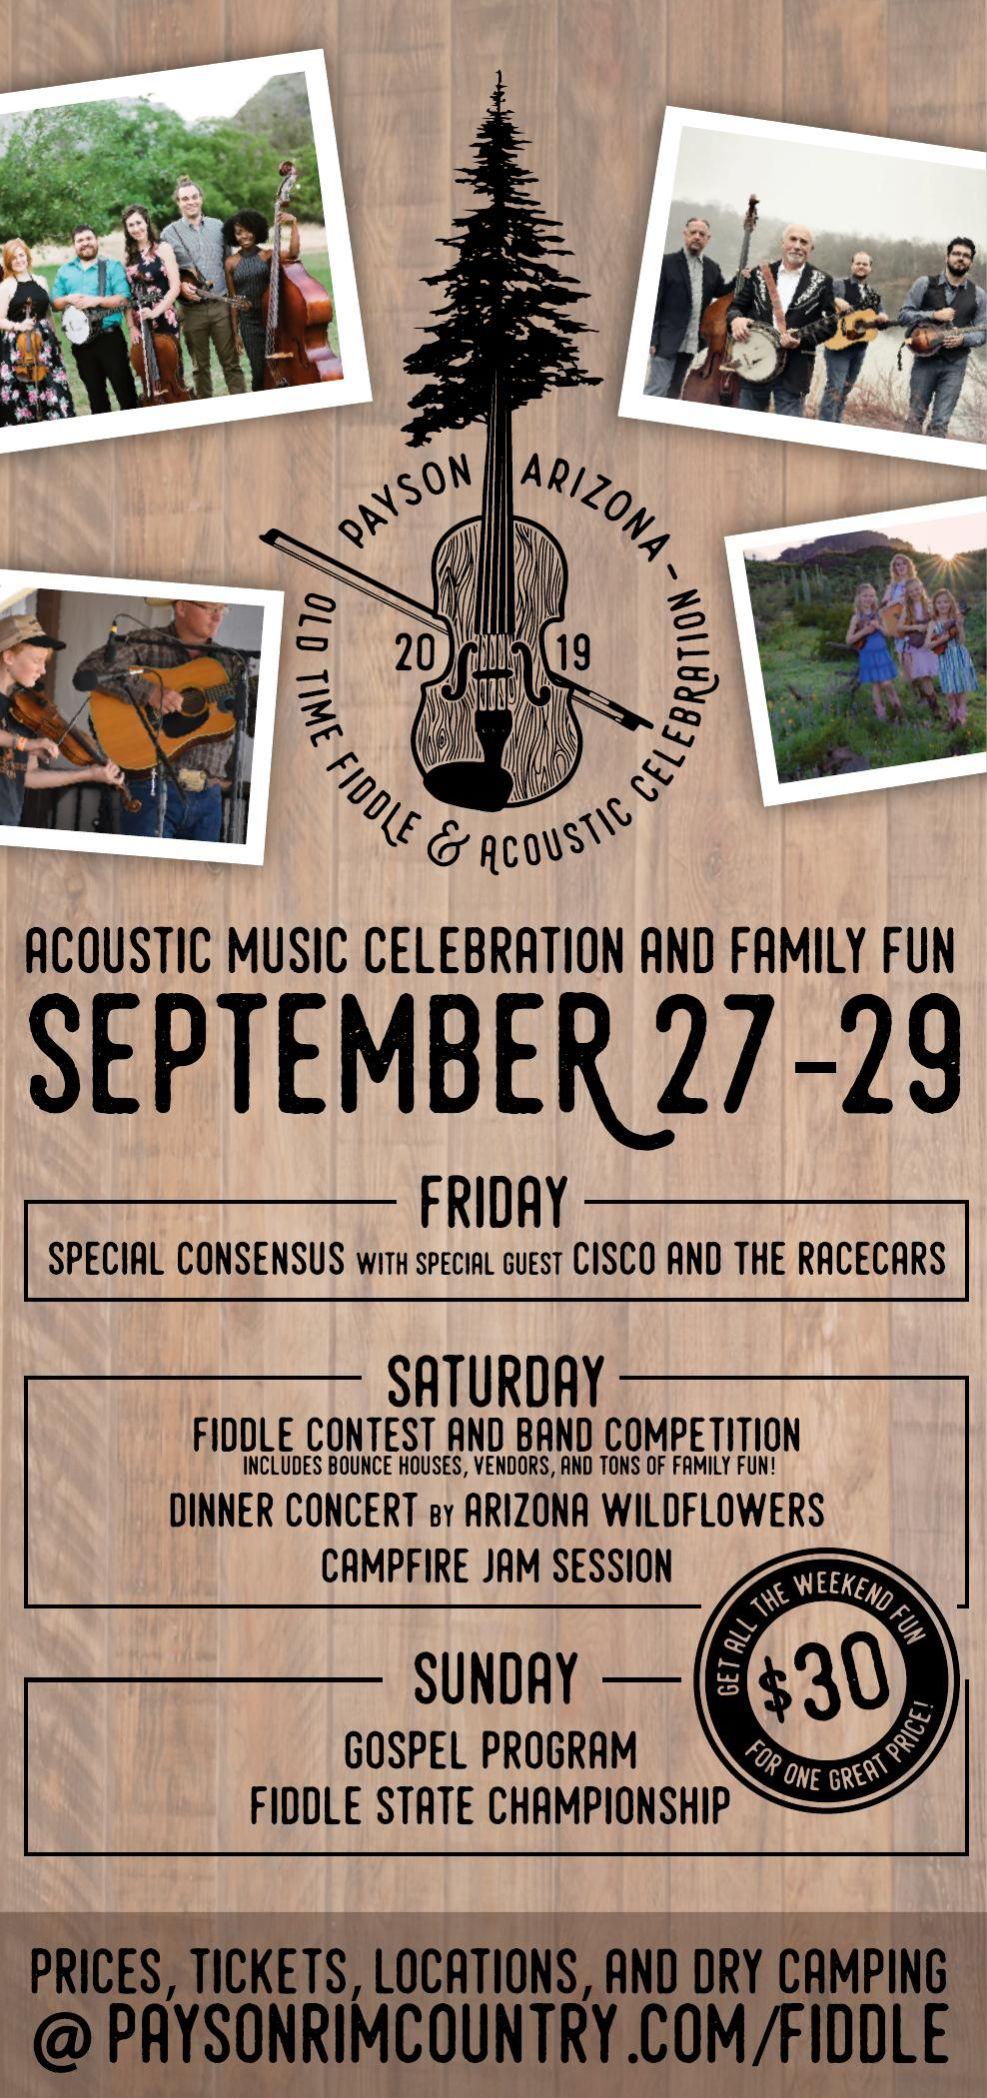 Old Time Fiddle & Acoustic Celebration